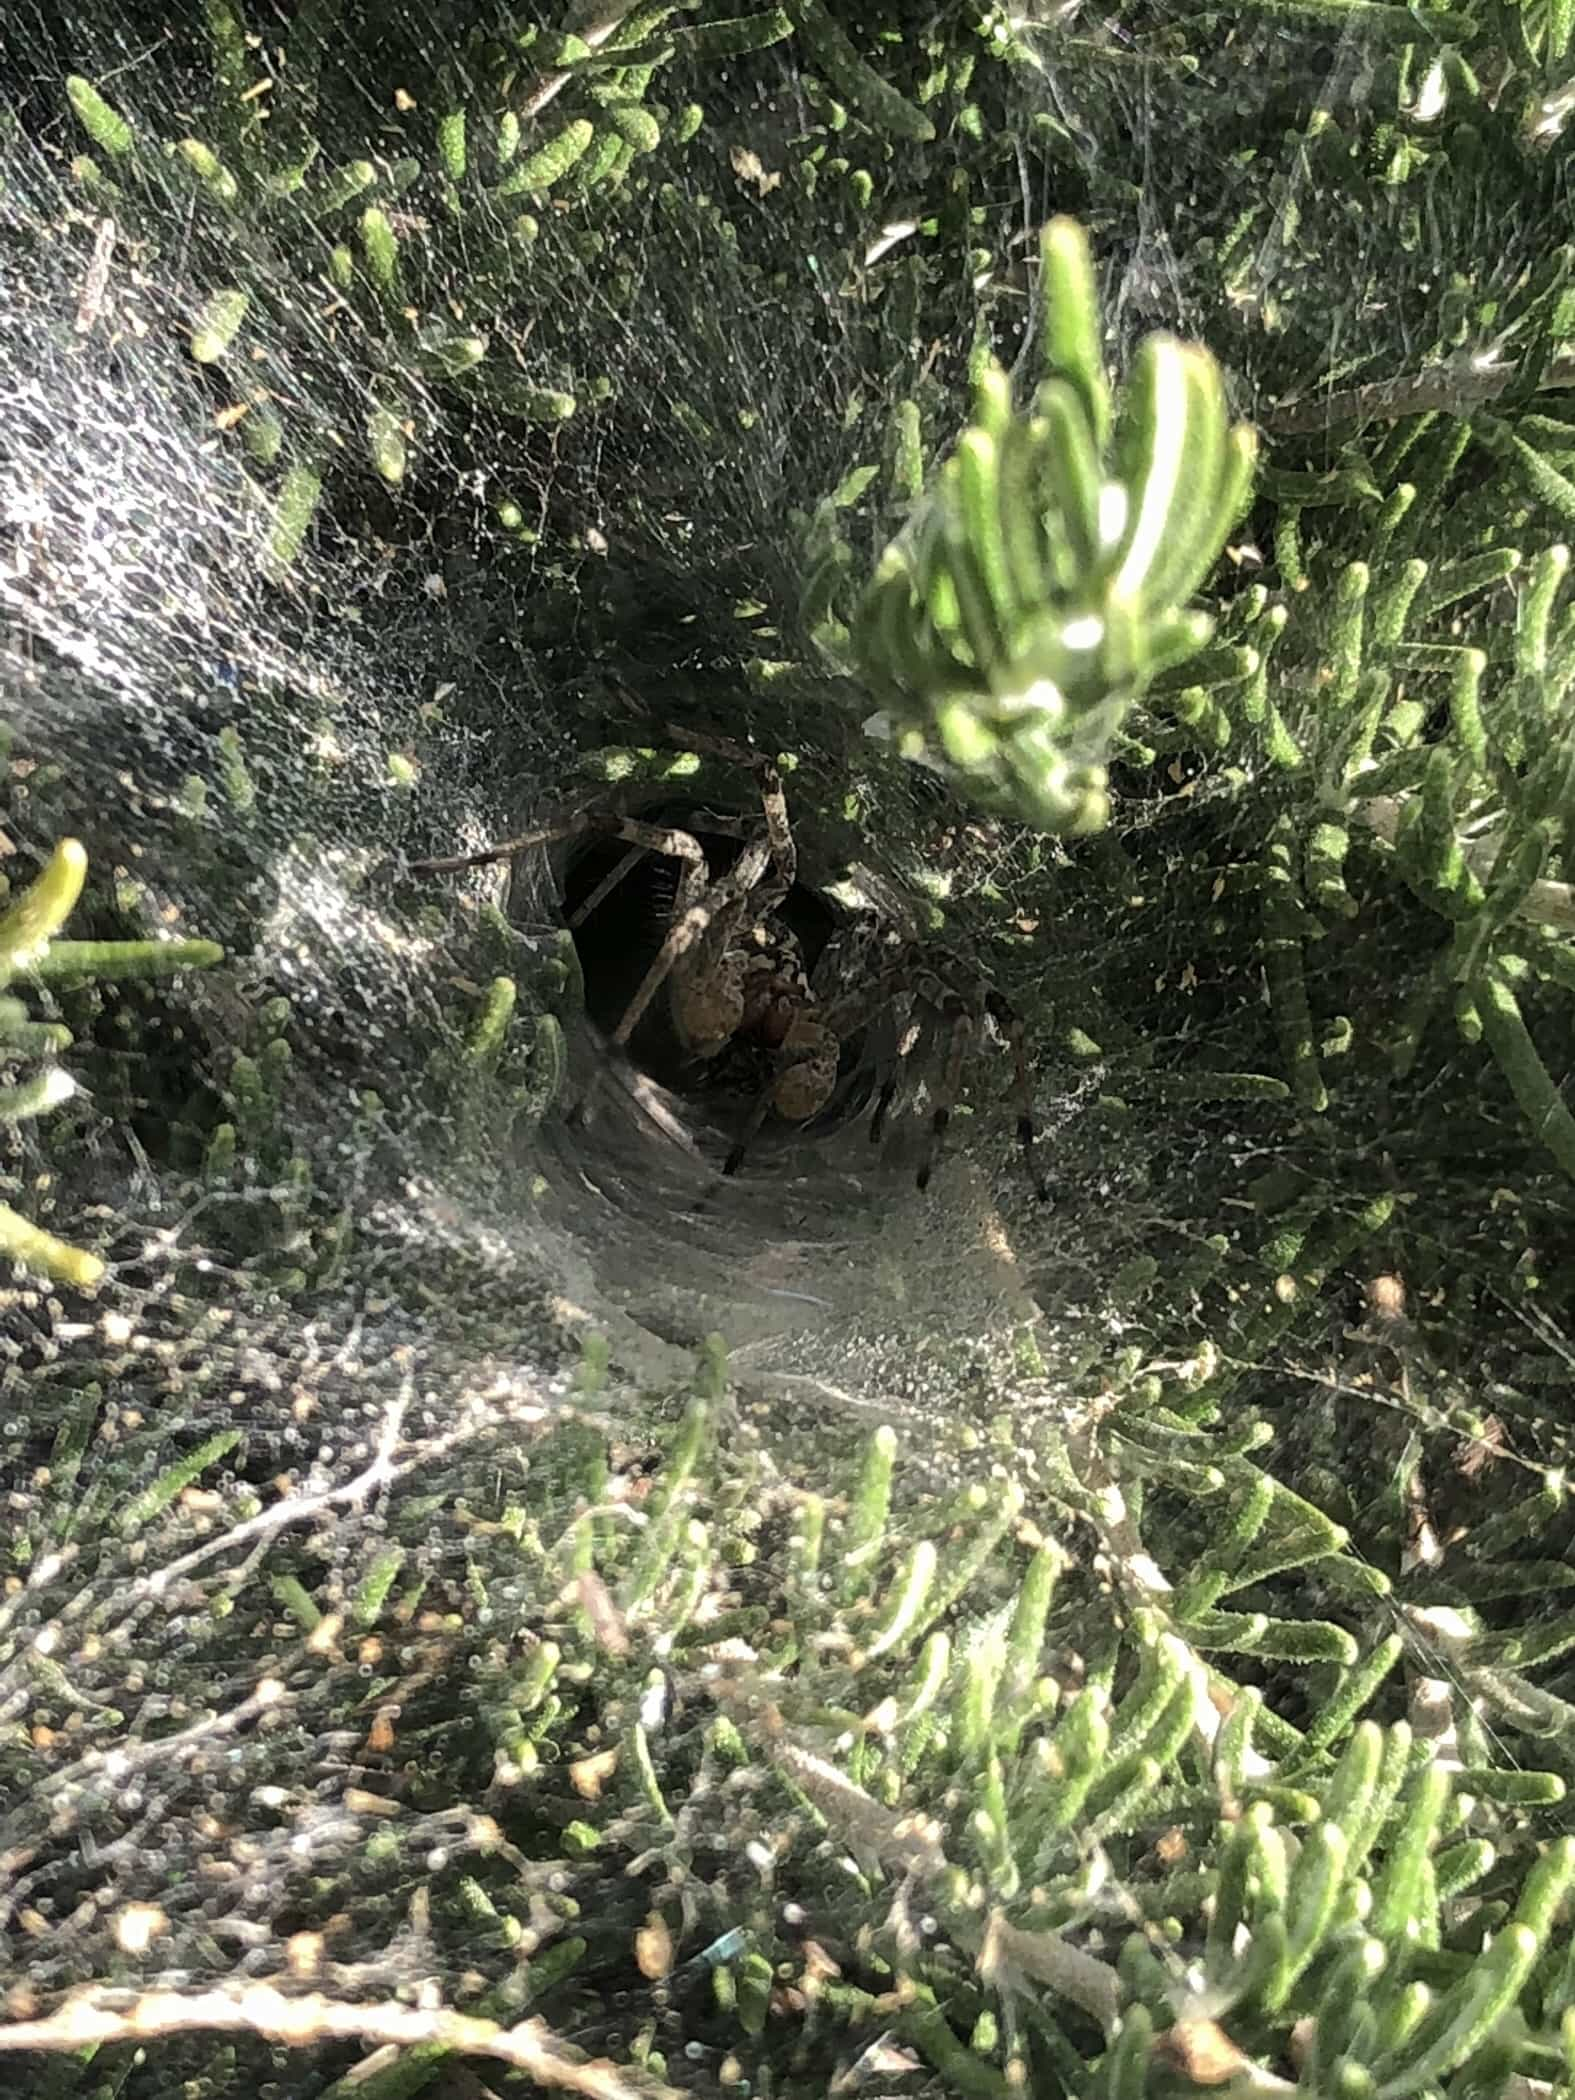 Picture of Agelenidae (Funnel Weavers) - Male - Webs,In Retreat